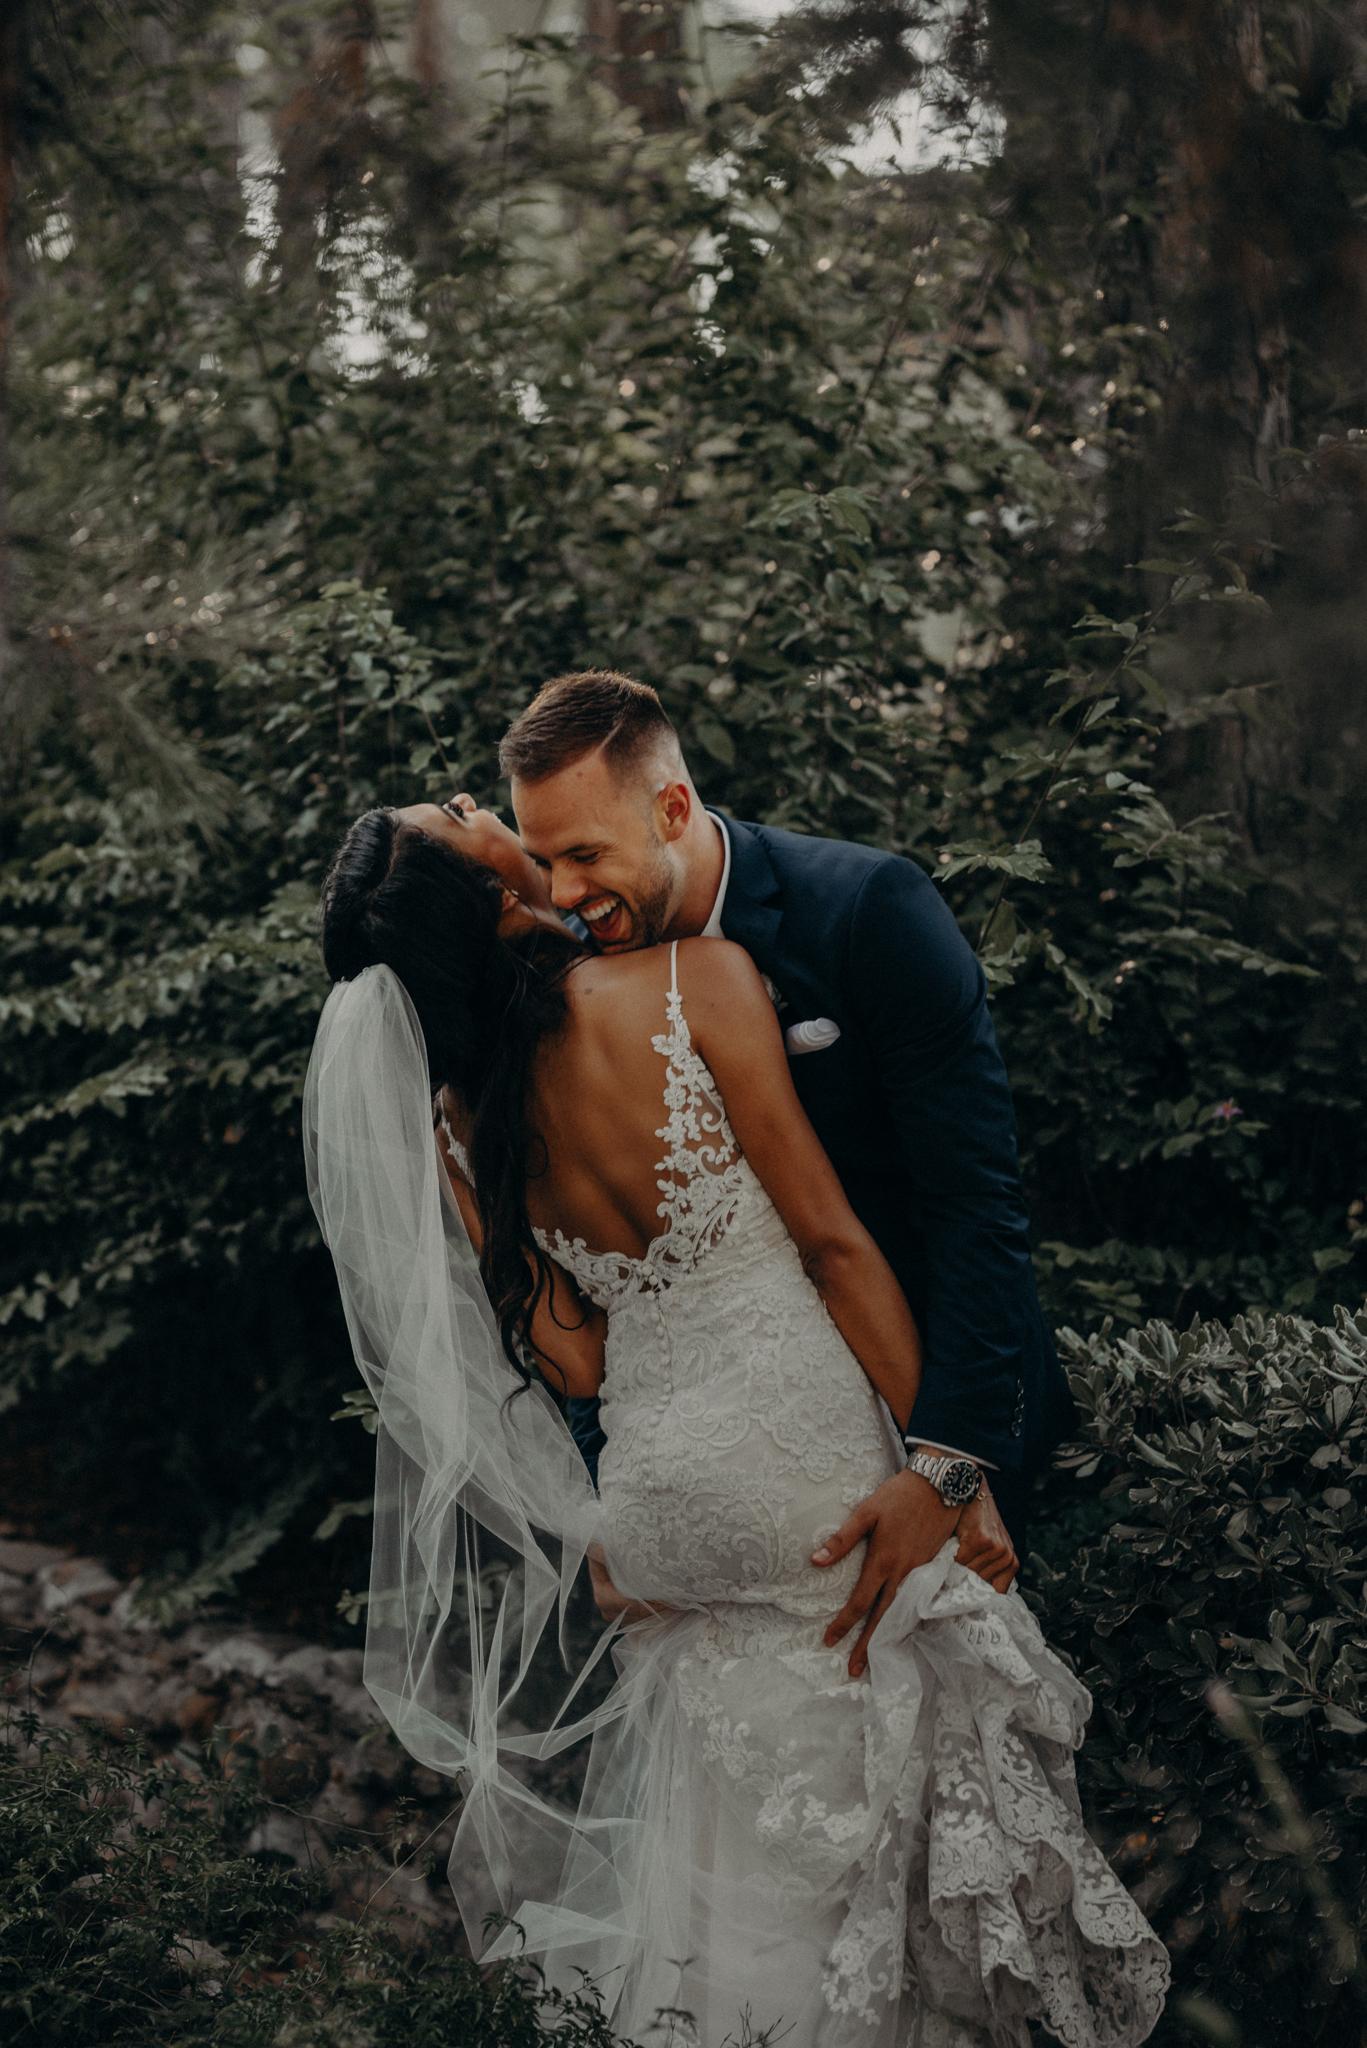 Isaiah + Taylor Photography - Rancho Las Lomas Wedding, Los Angeles Wedding Photographer-101.jpg